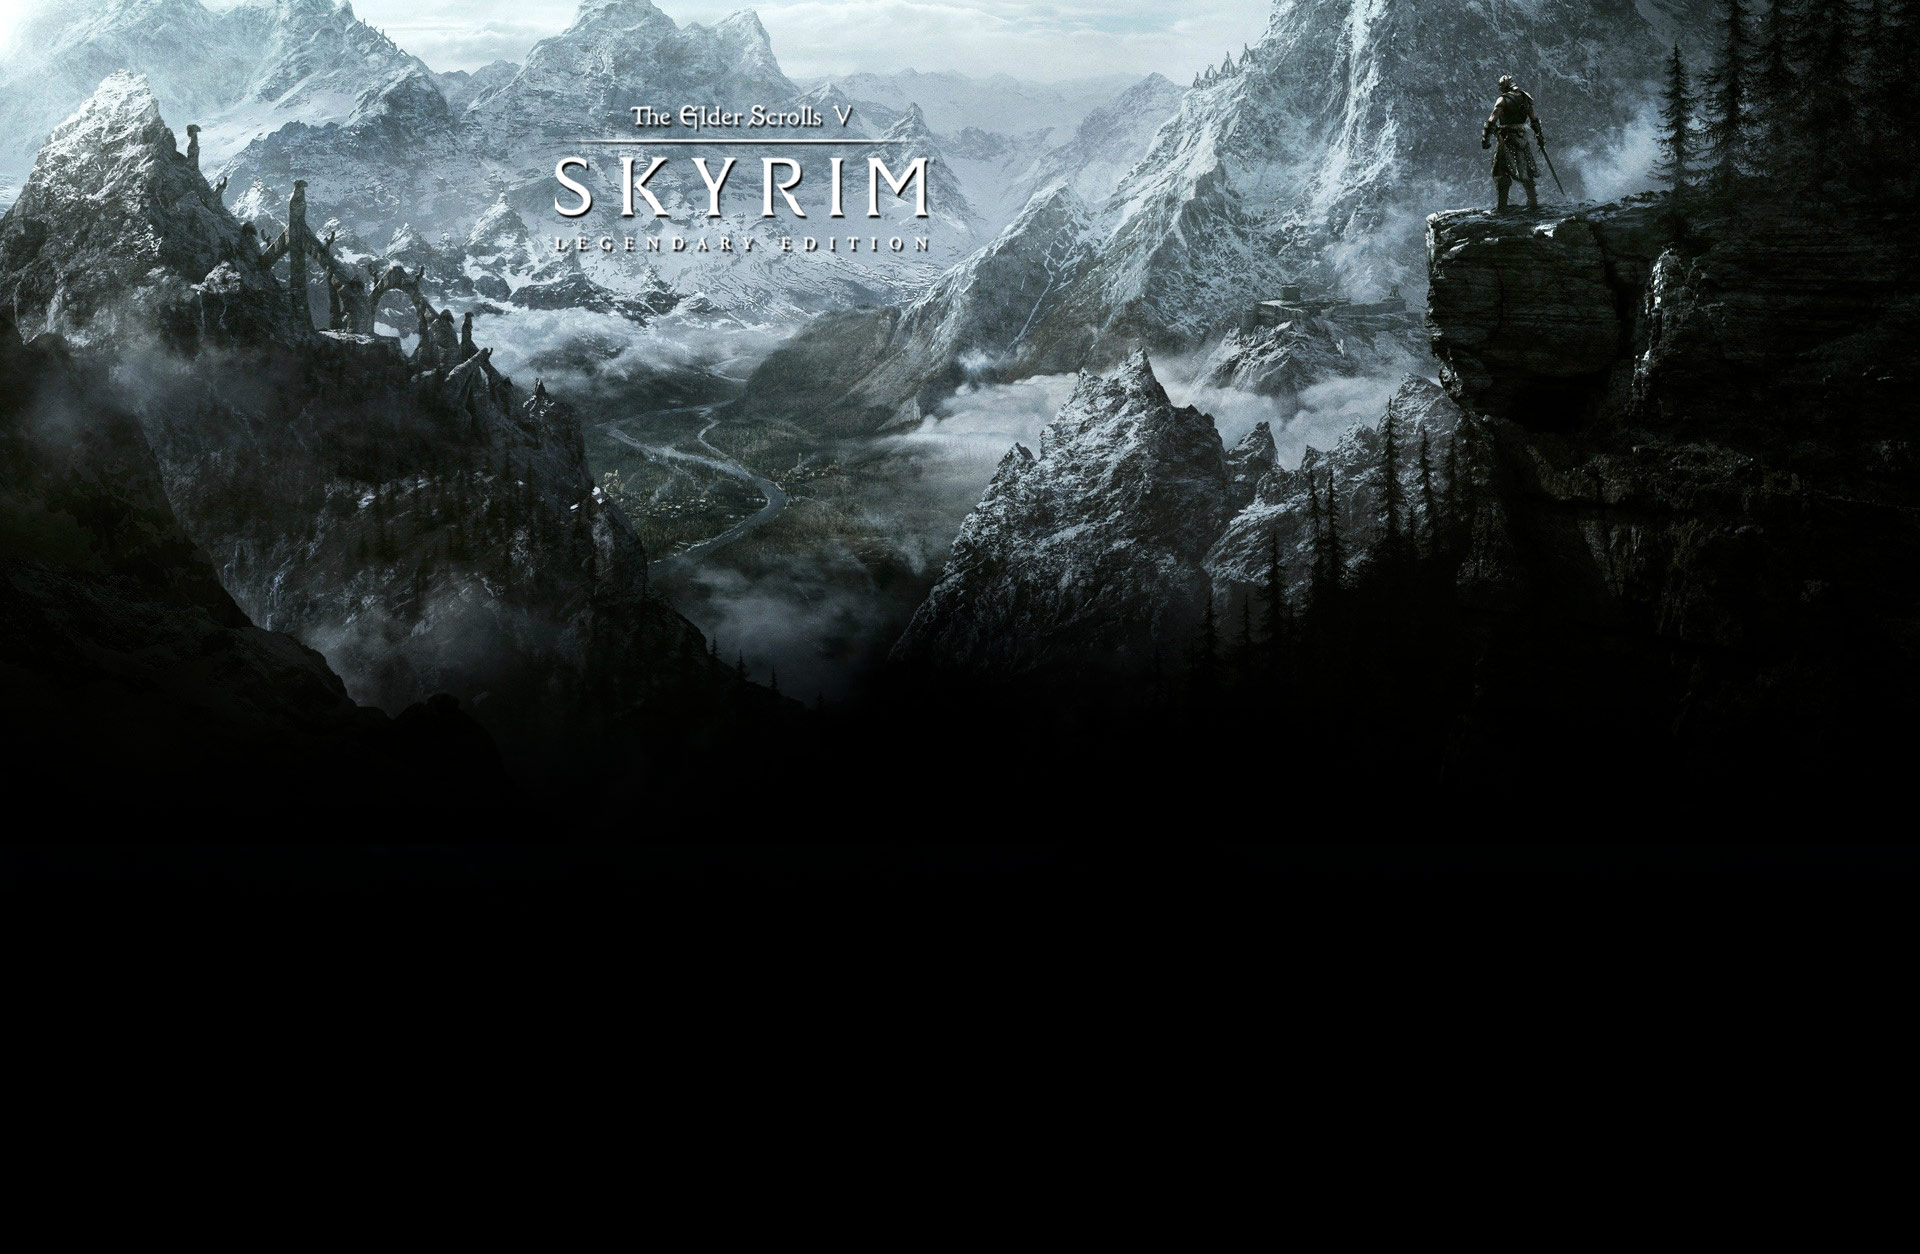 The Elder Scrolls V: Skyrim Legendary Edition | GAMESLOAD